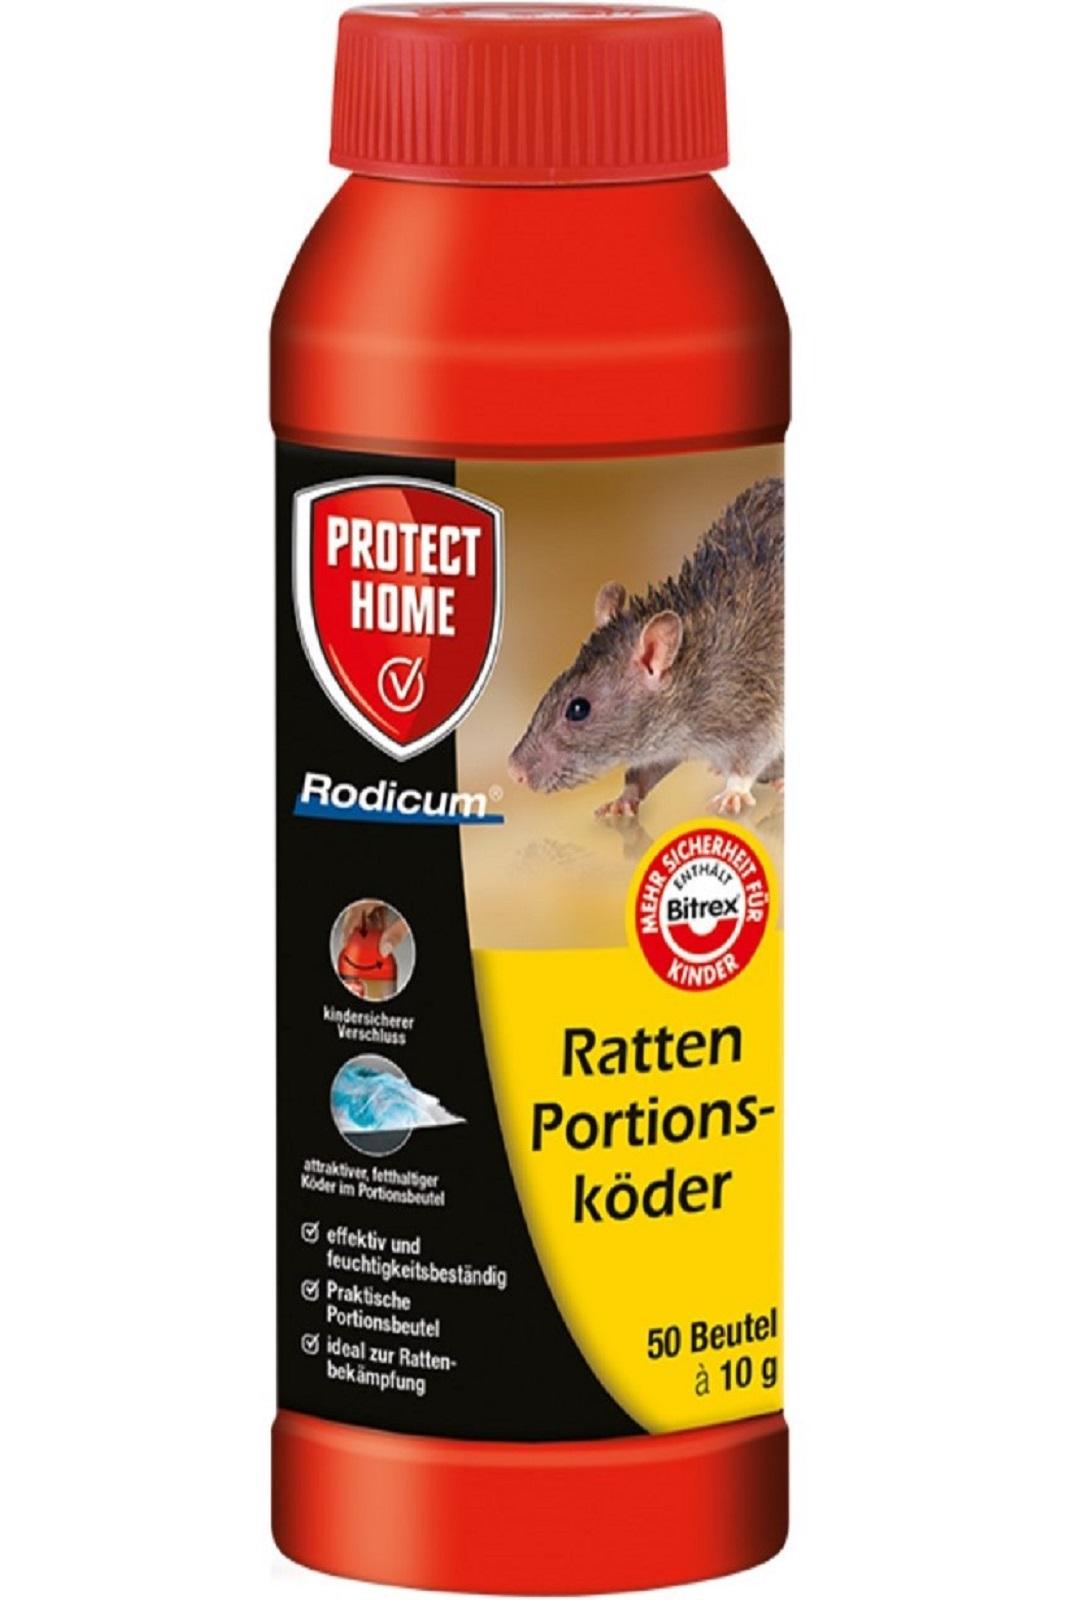 Protect Home Rodicum Ratten Portionsköder Rattengift 500 g